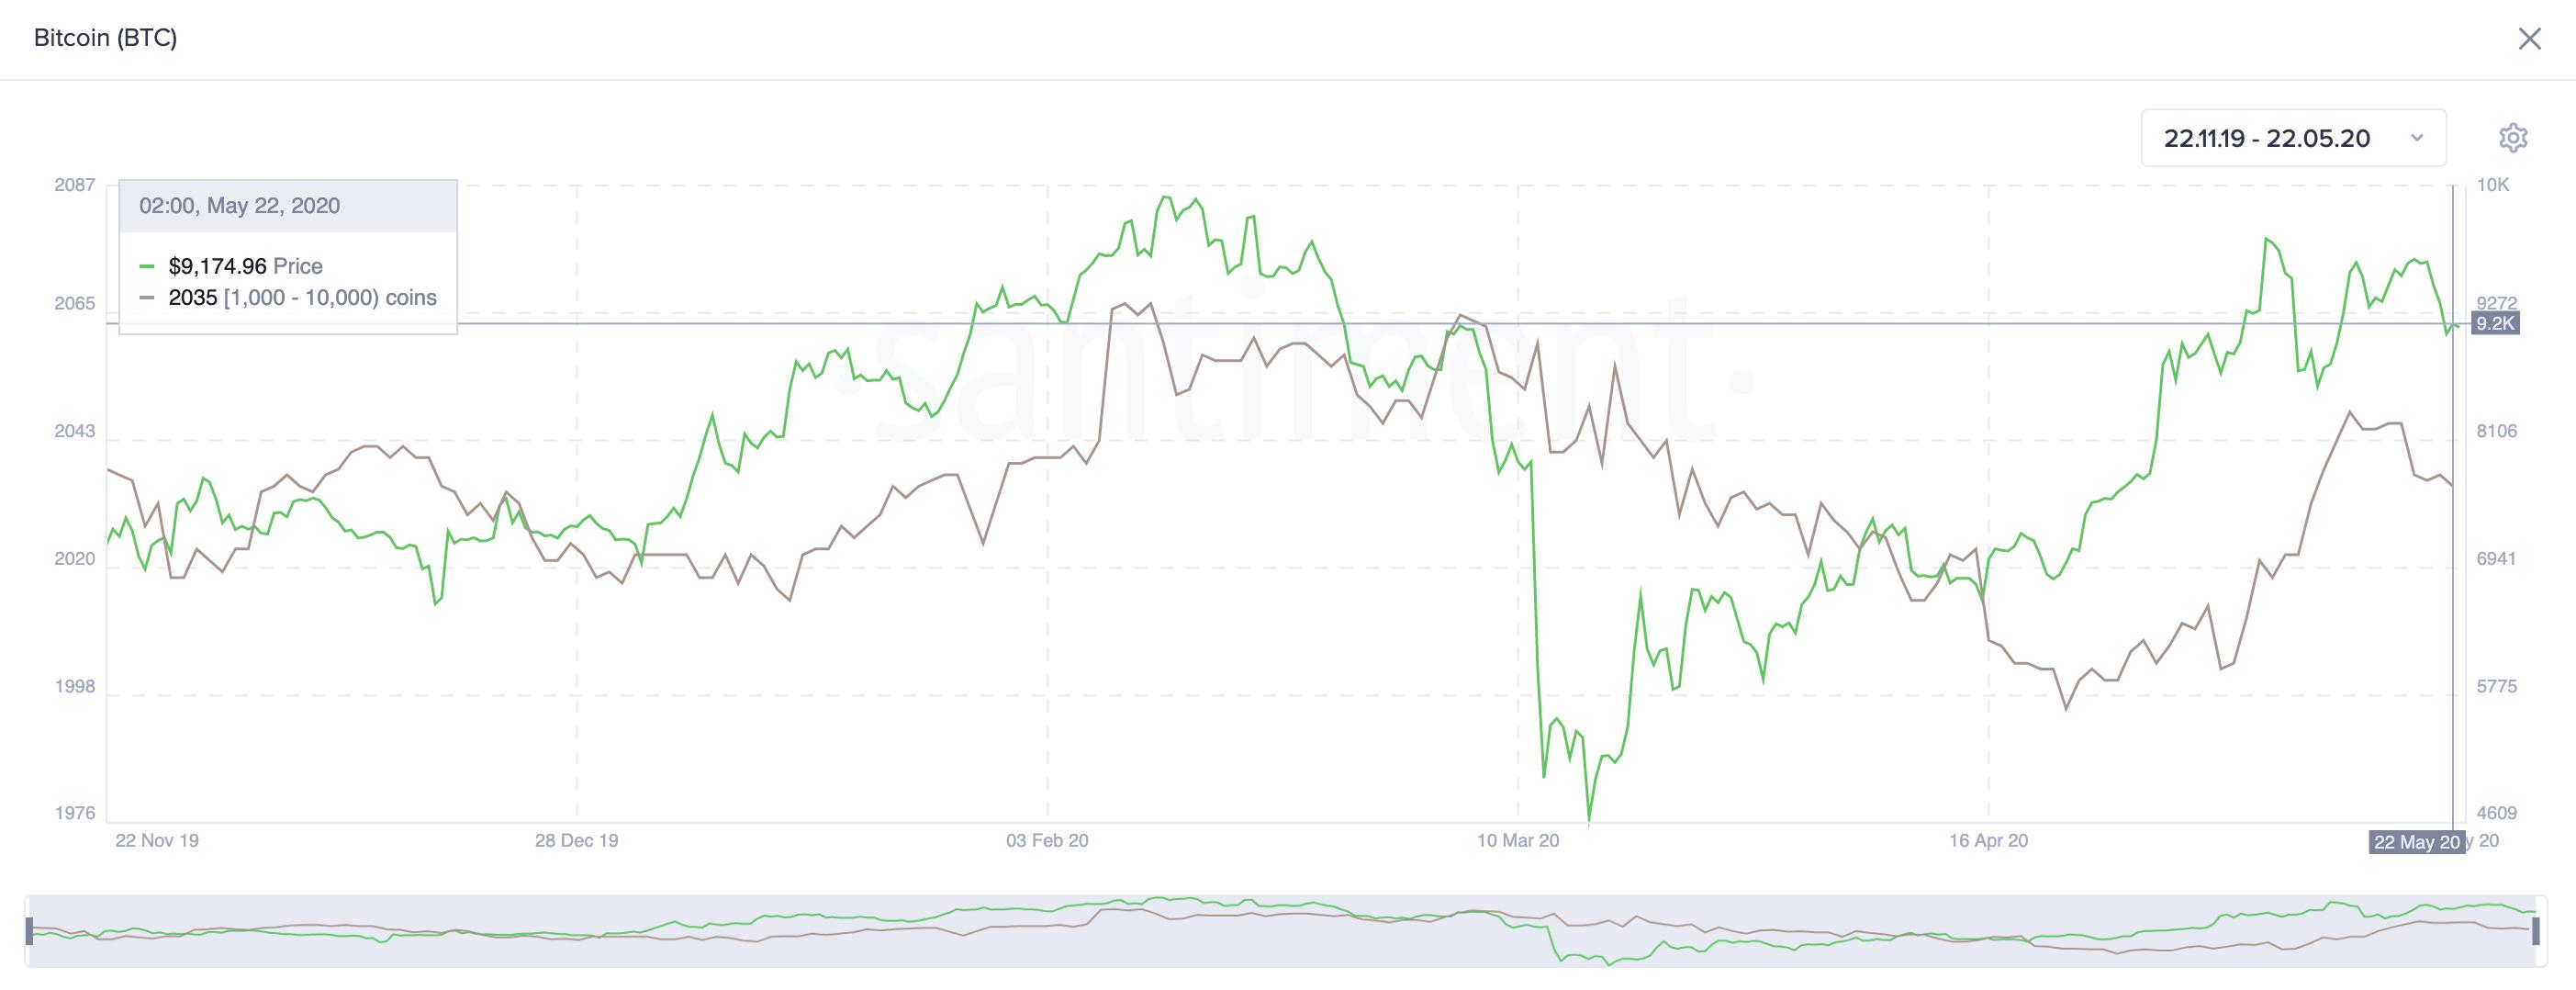 Bitcoin's Holders Distribution. (Source: Santiment)